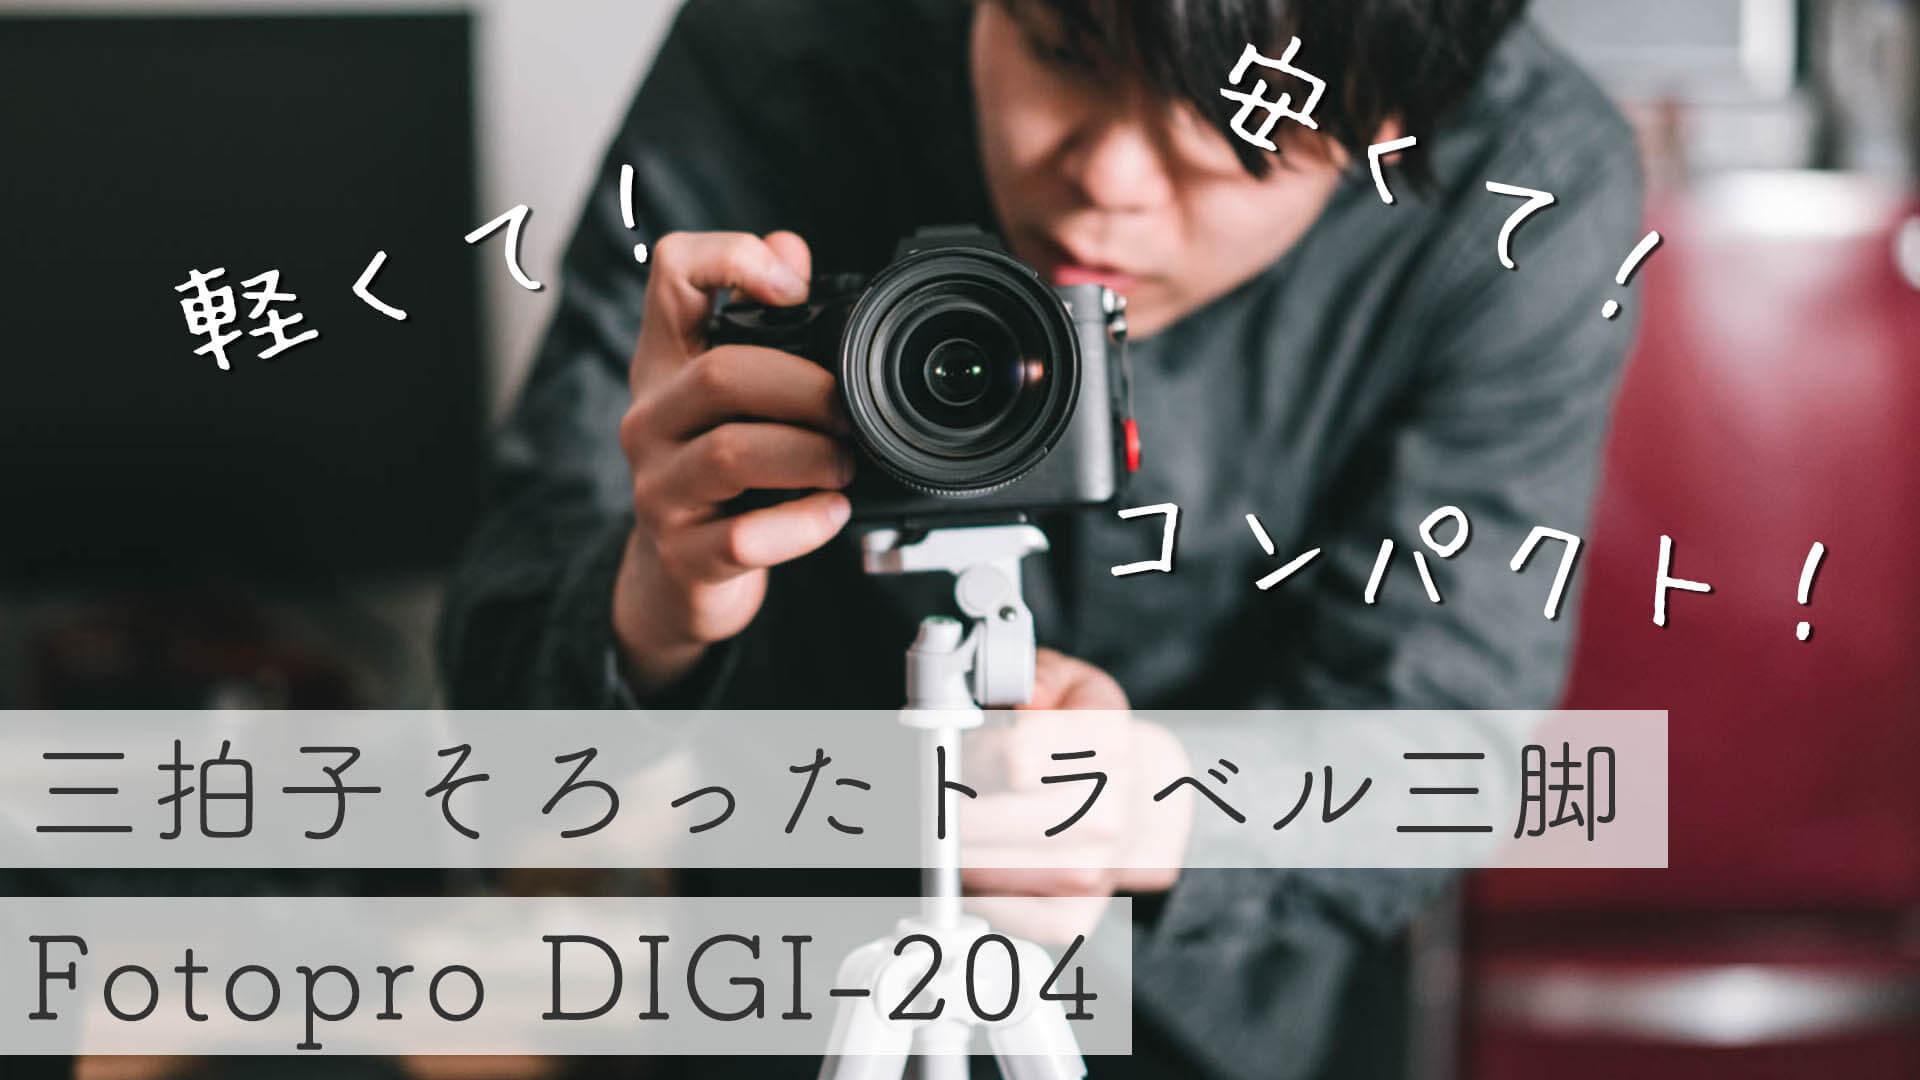 Fotopro DIGI-204のメイン画像